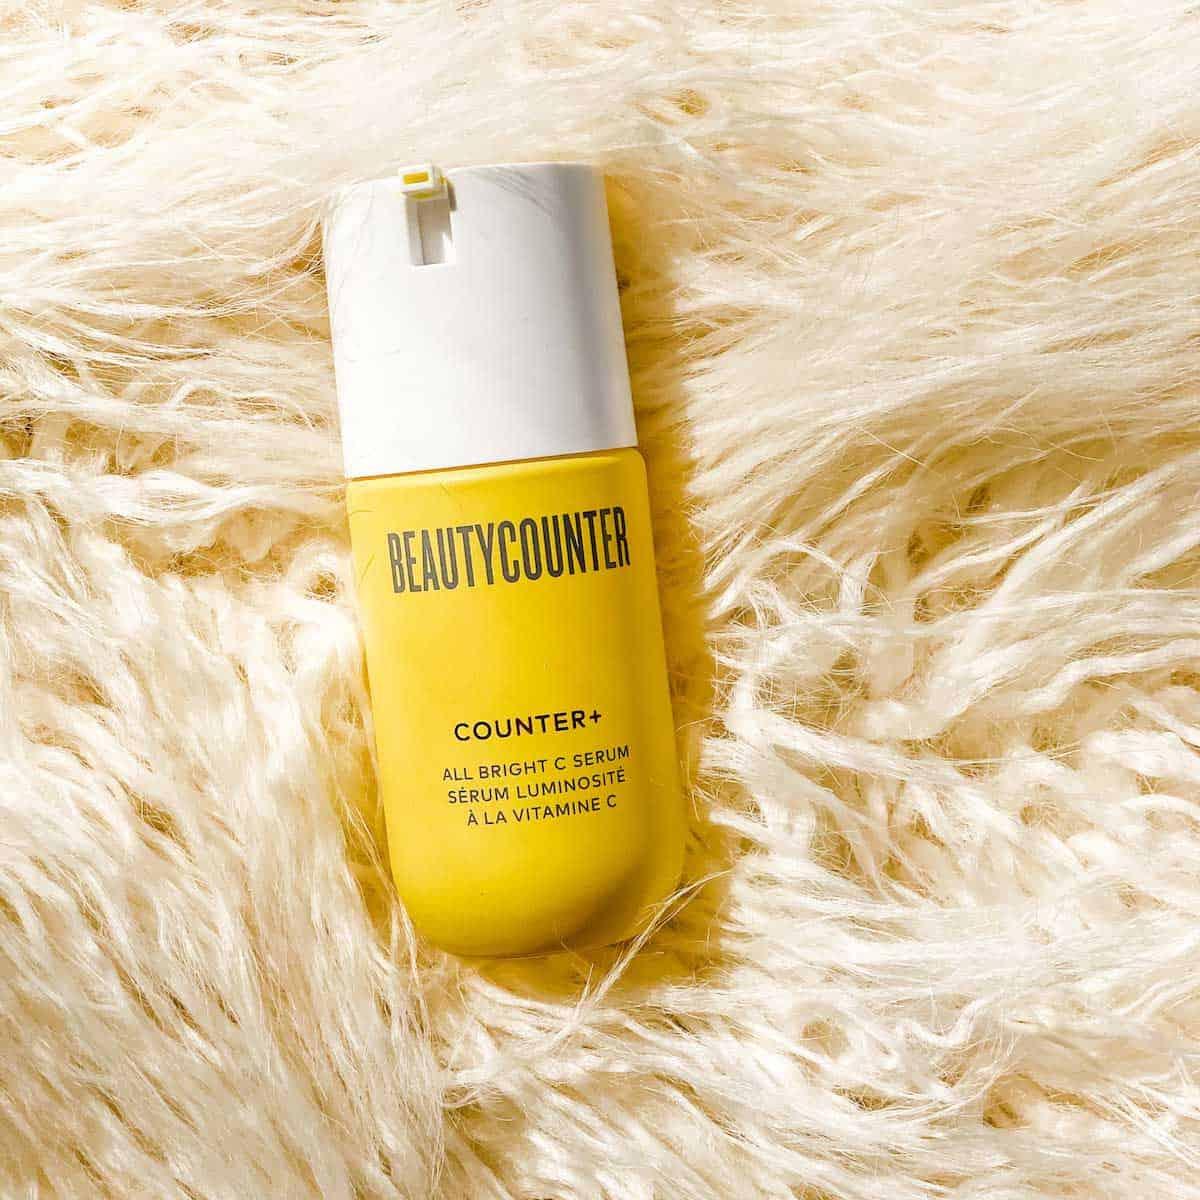 Photo of Beautycounter Counter+ All Bright C Serum on a cream rug.